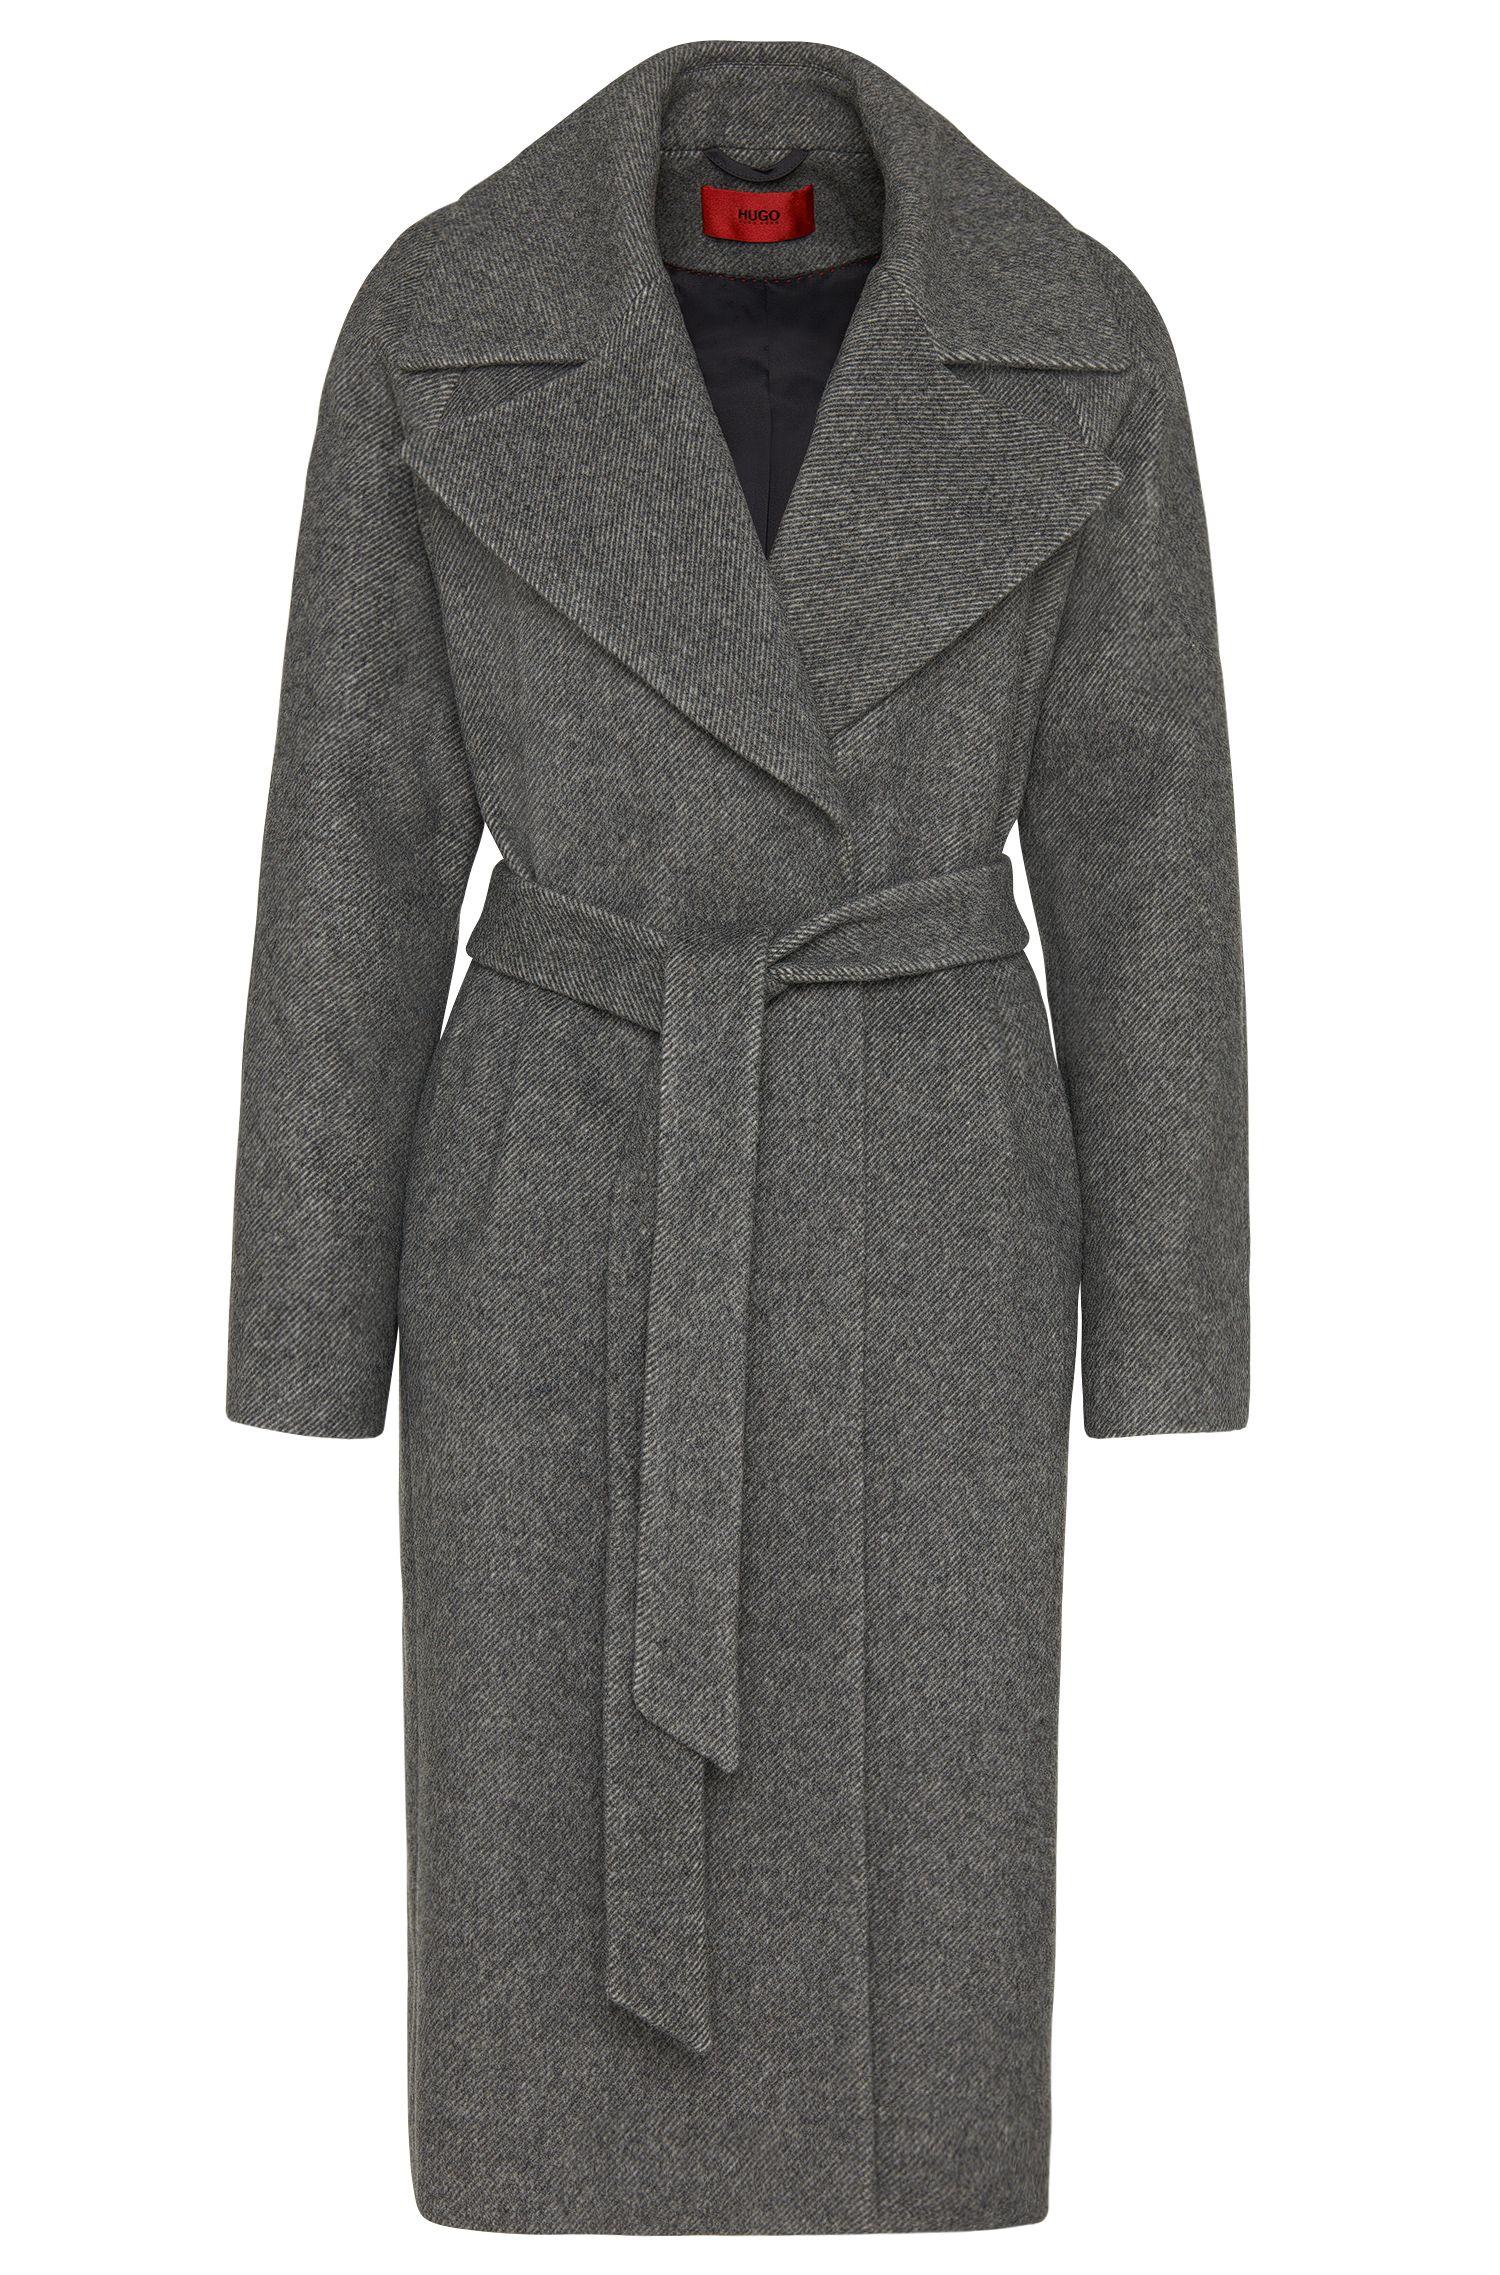 'Meone' | Virgin Wool Blend Open Front Coat